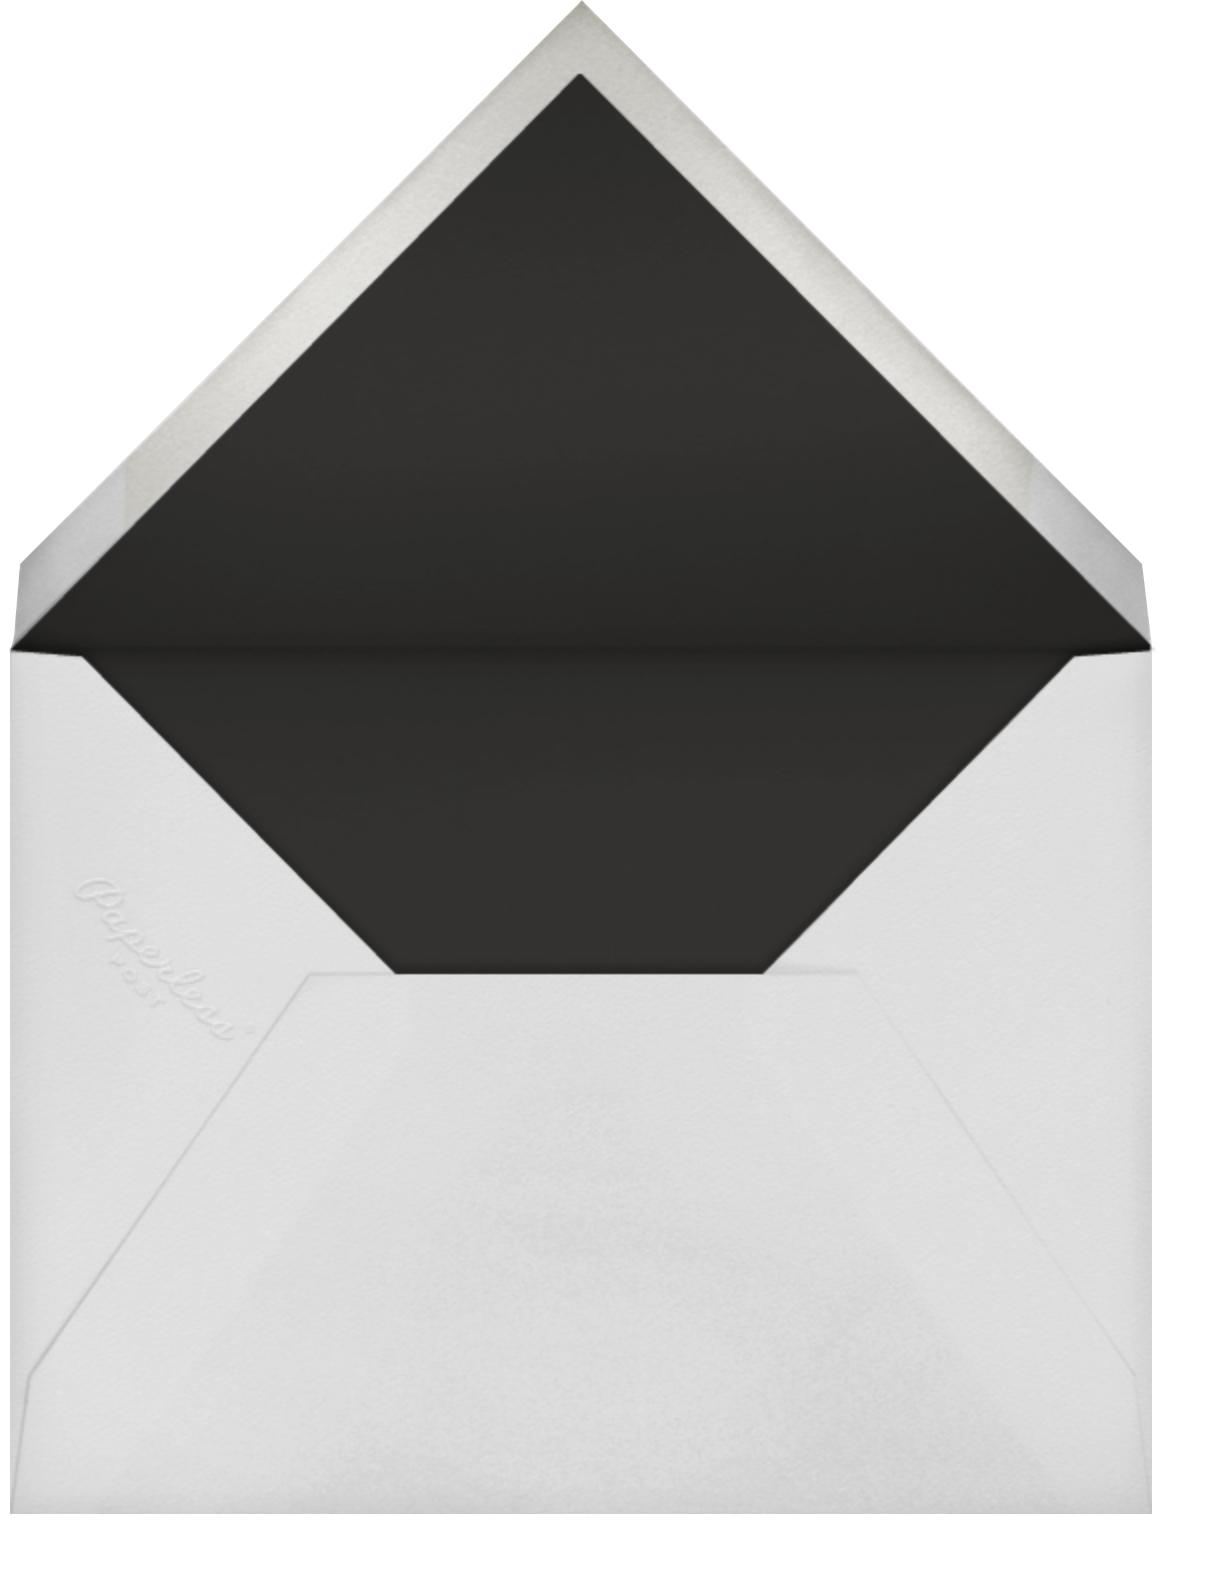 Foiled Frame (Tall) - Gold - Paperless Post - Bachelorette party - envelope back